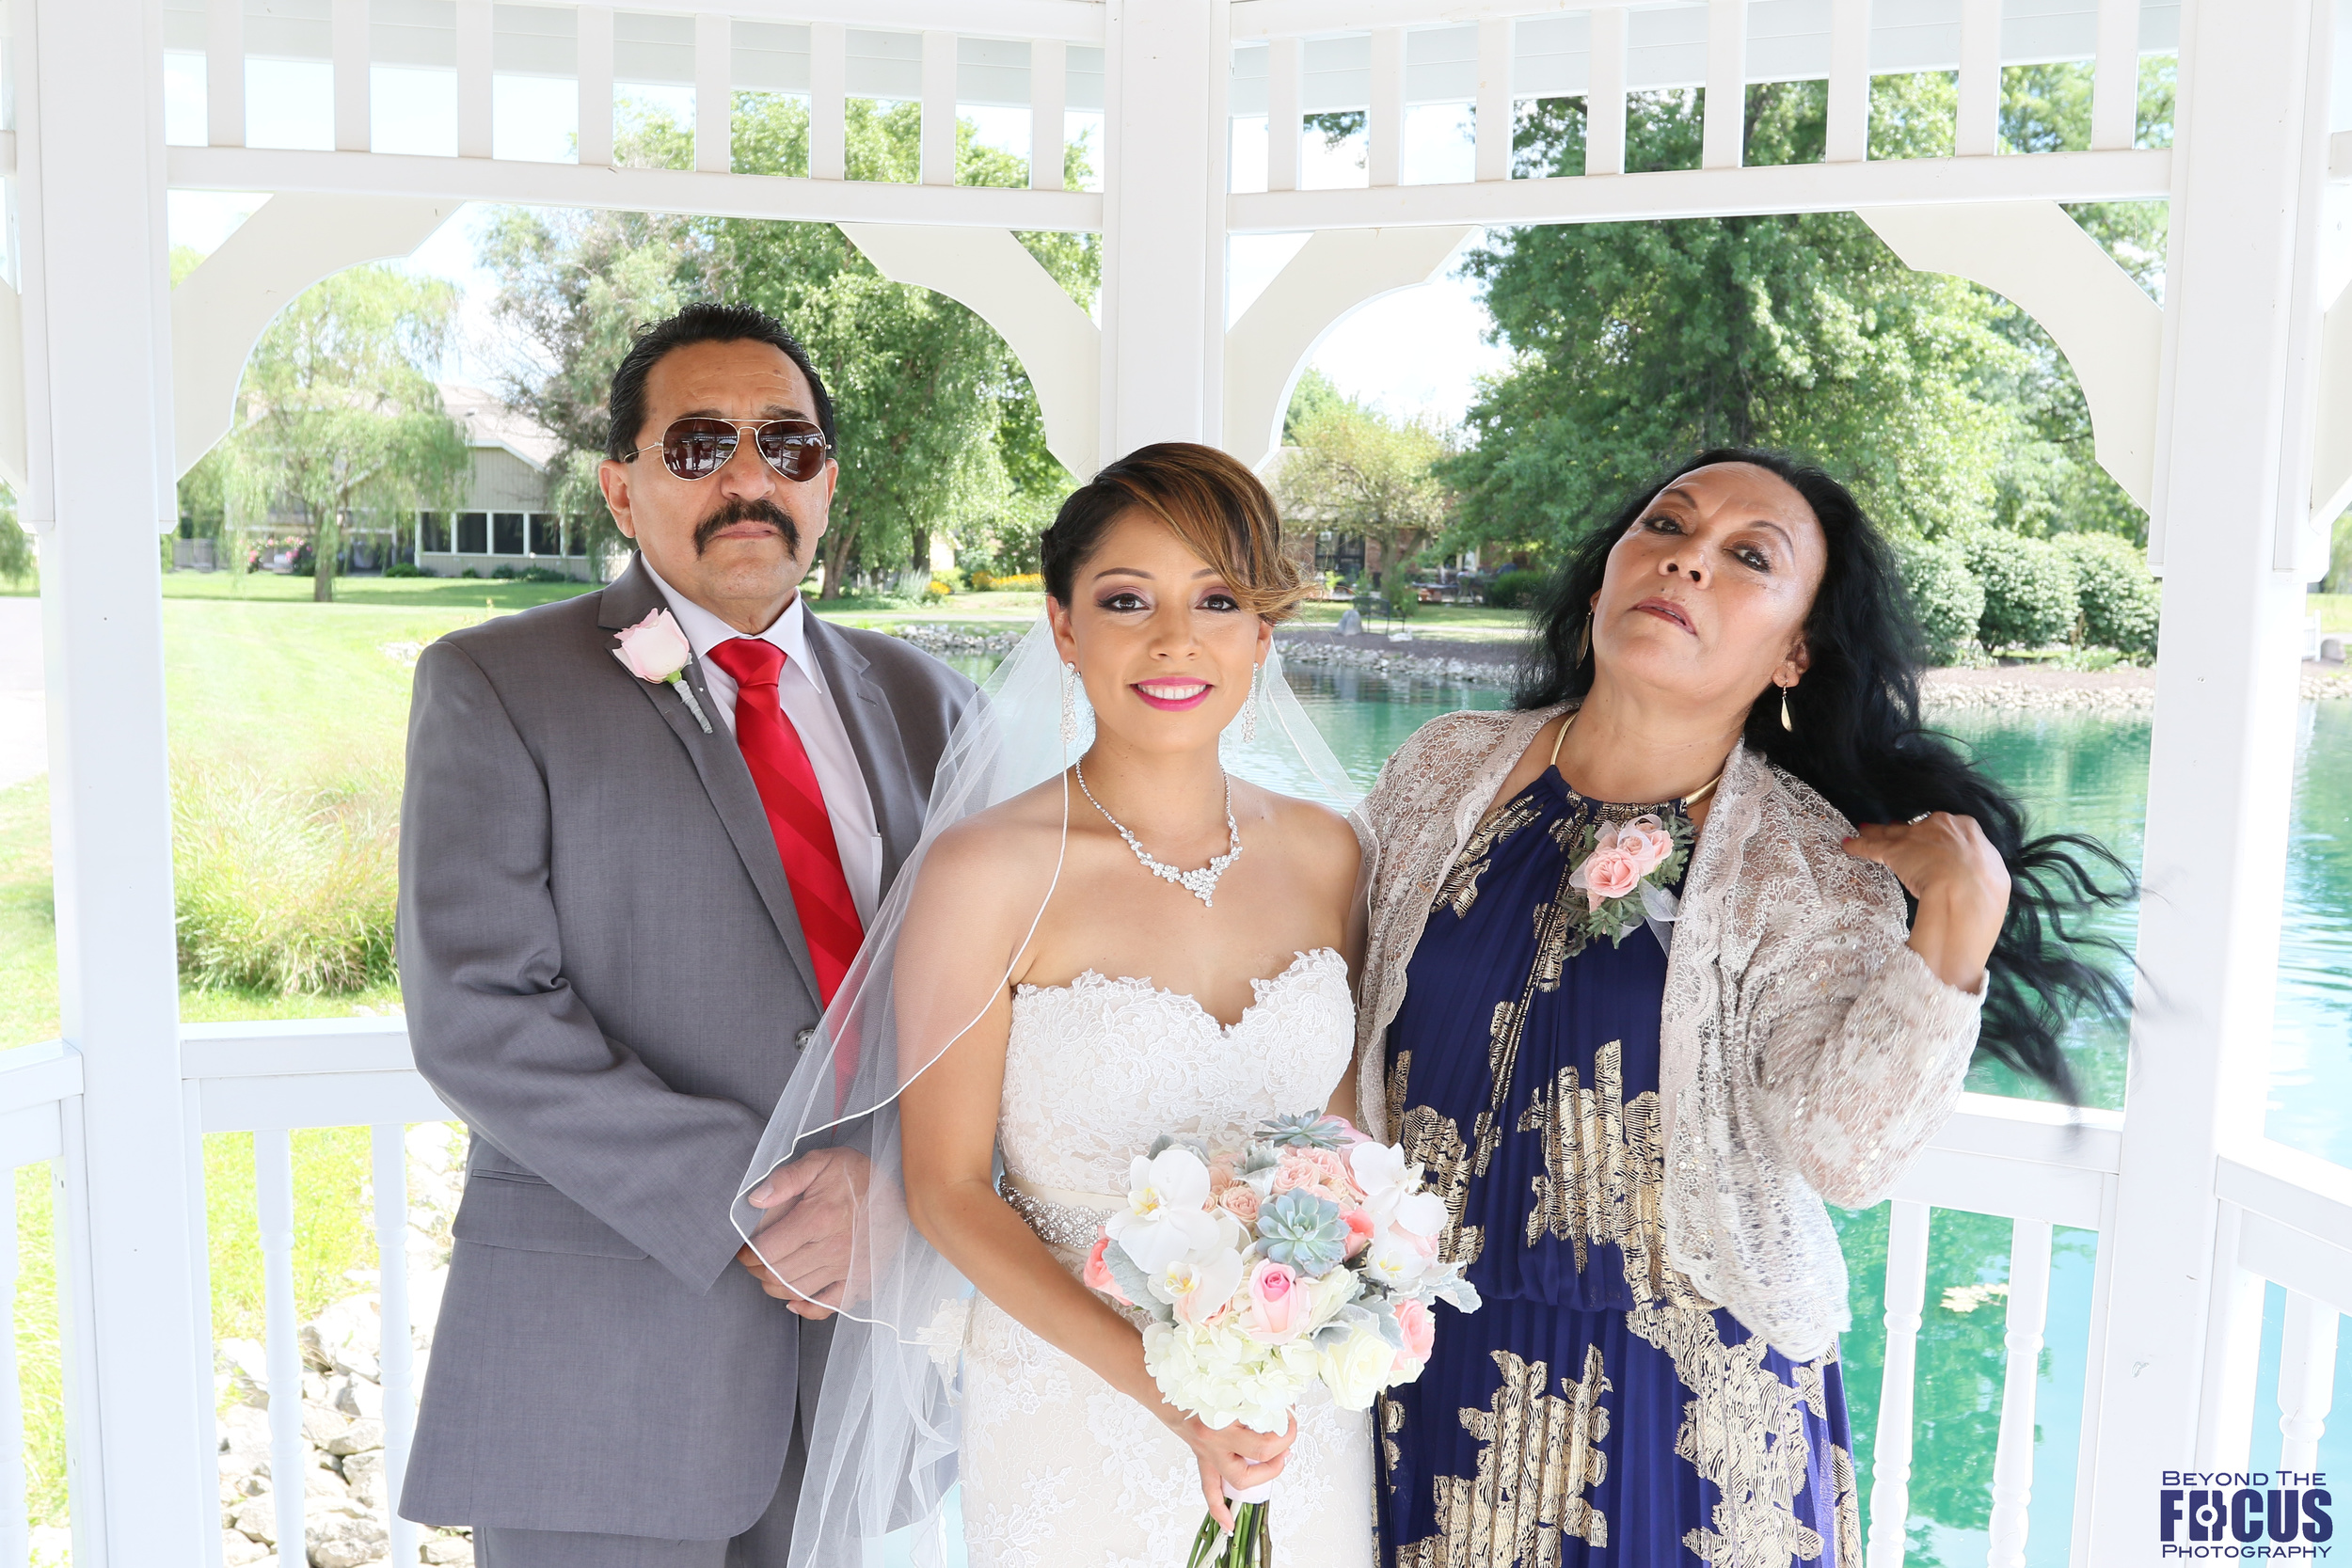 Palmer Wedding - Candids96.jpg